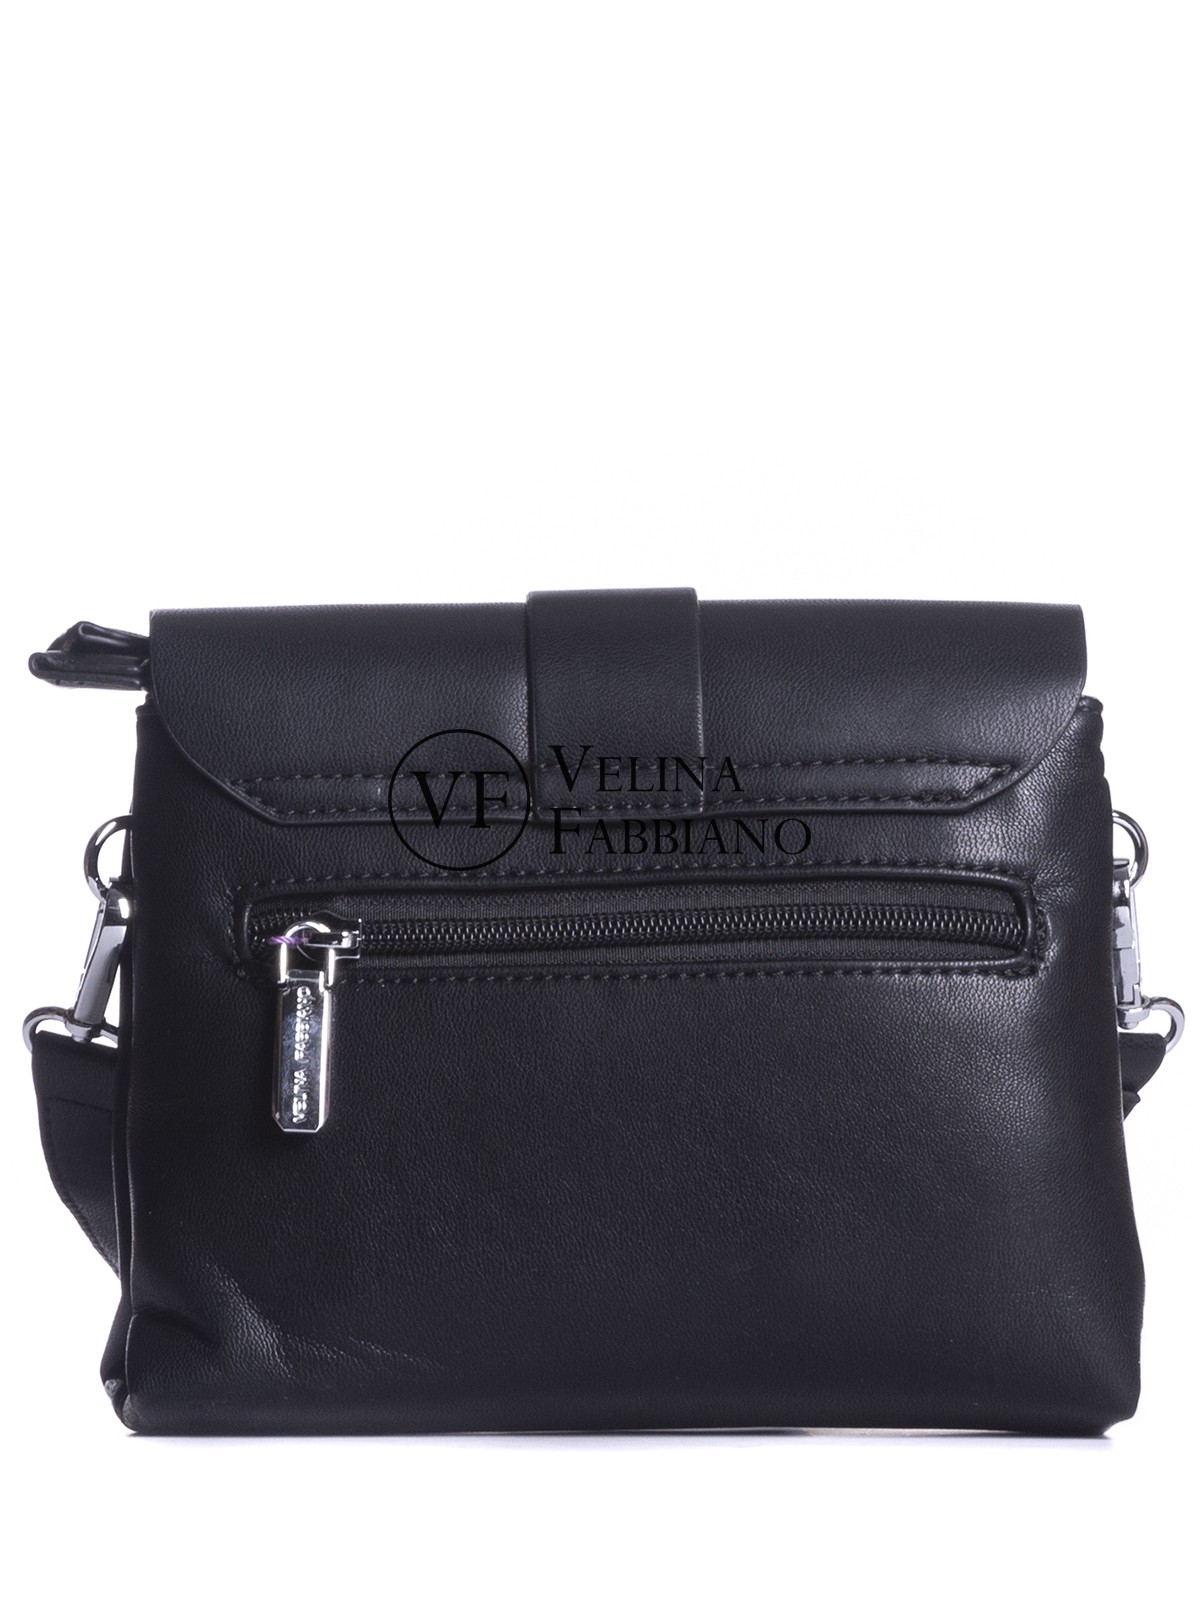 Кросс-боди Velina Fabbiano 553092-1-black